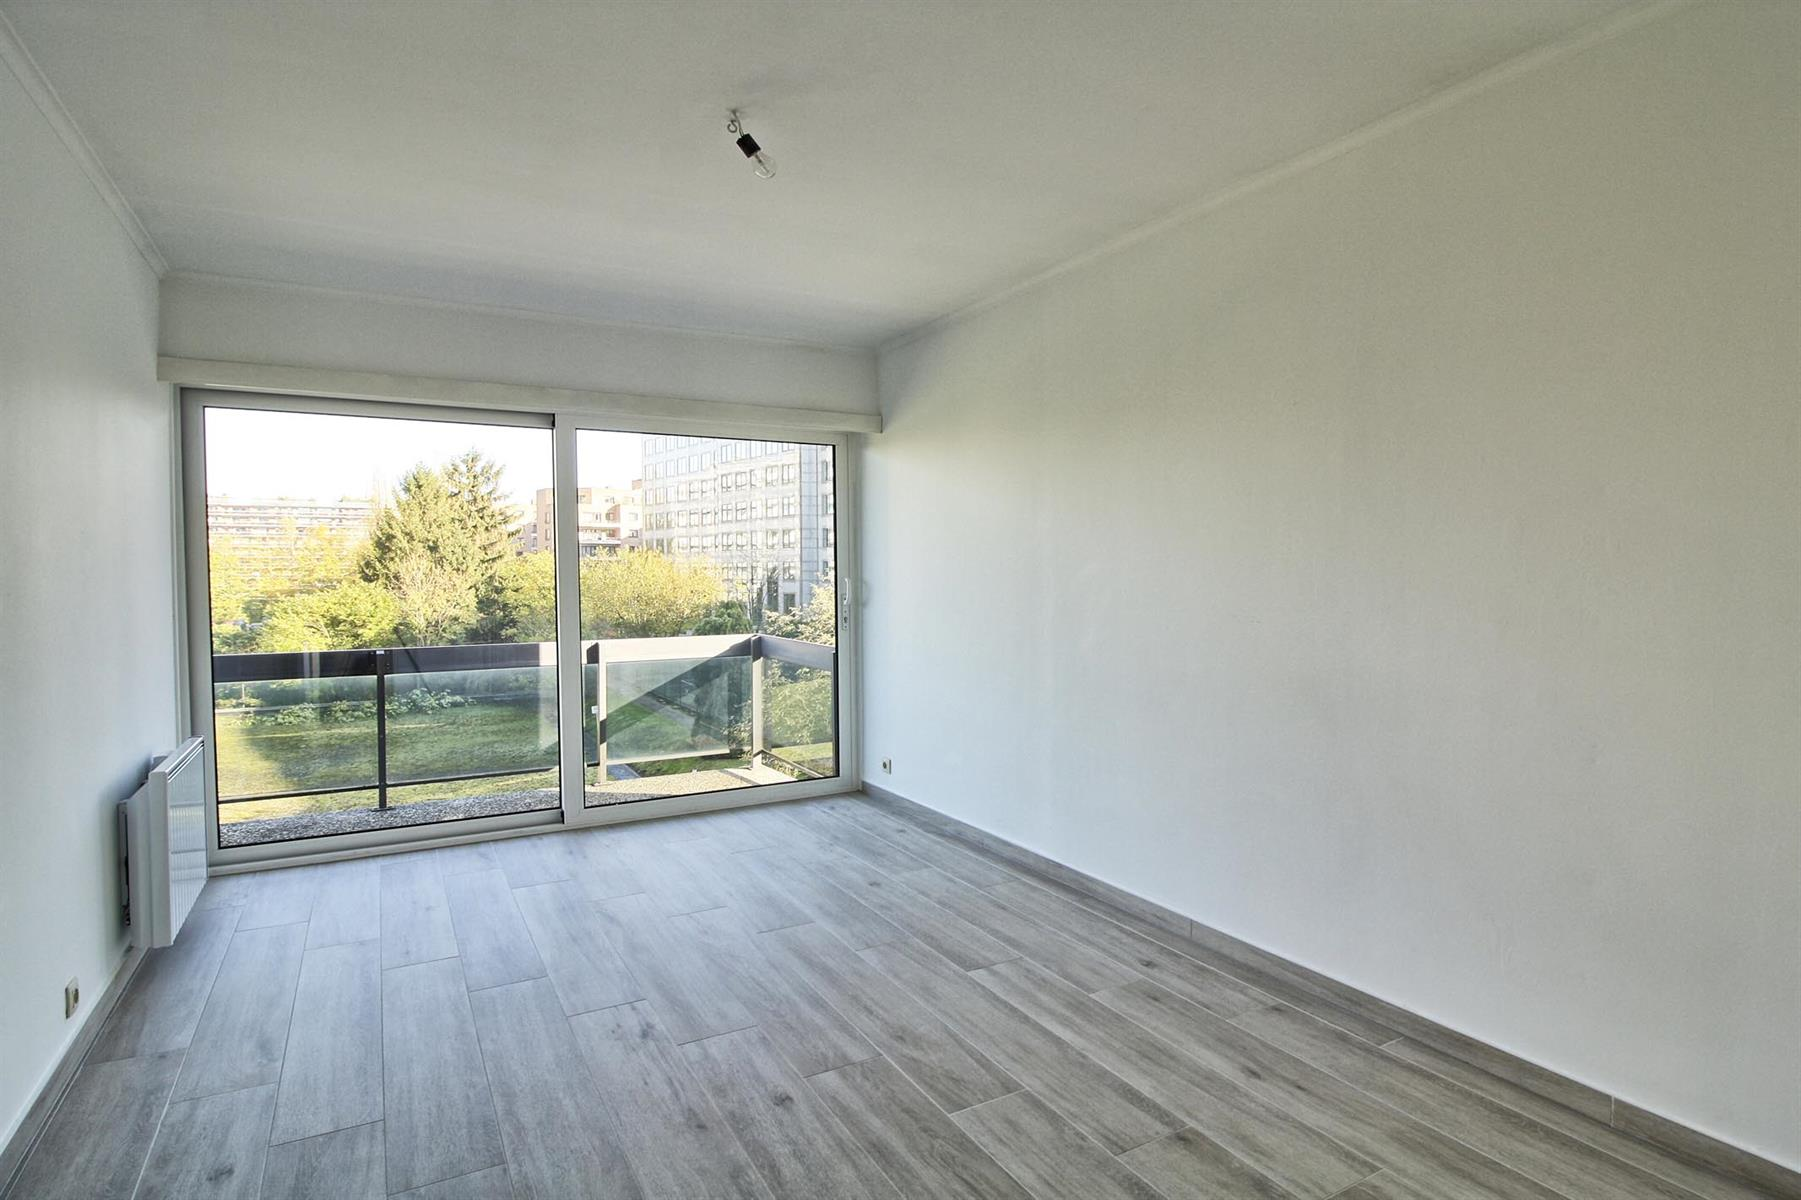 Appartement - Woluwe-Saint-Lambert - #4237926-5